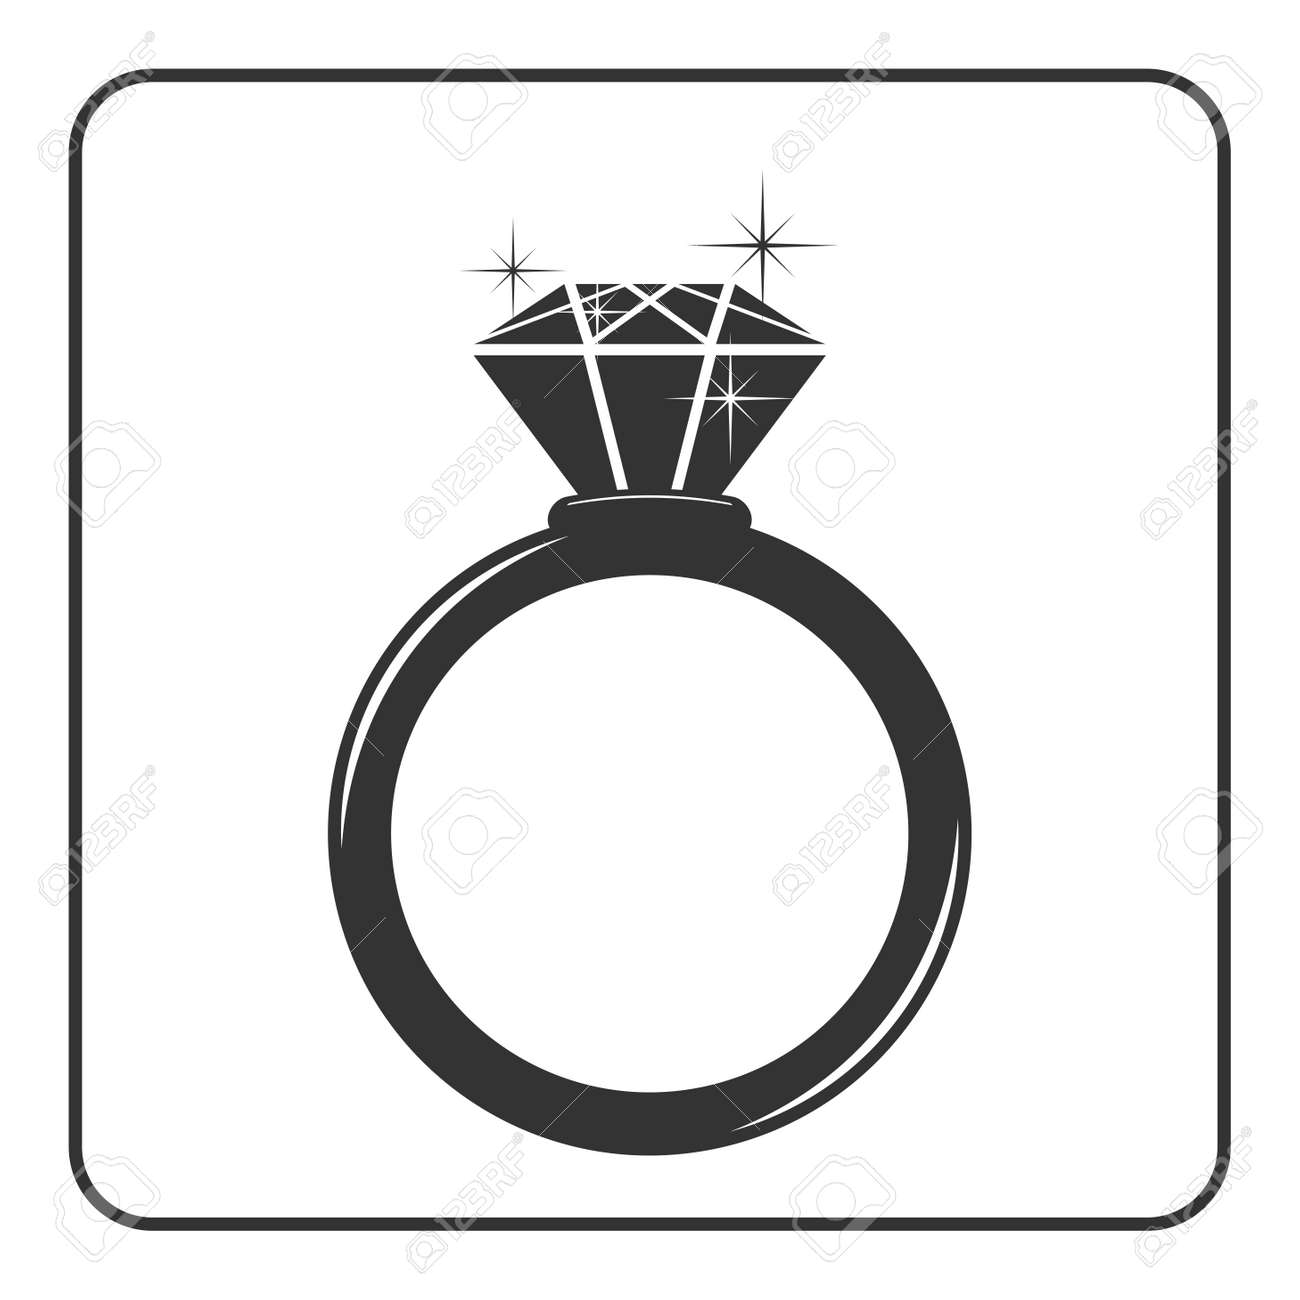 Diamond engagement ring icon. Shiny sparkle crystal sign. Black circle silhouette isolated on white background Flat fashion design element. Symbol engagement, gift, jewel expensive Vector Illustration - 56914676